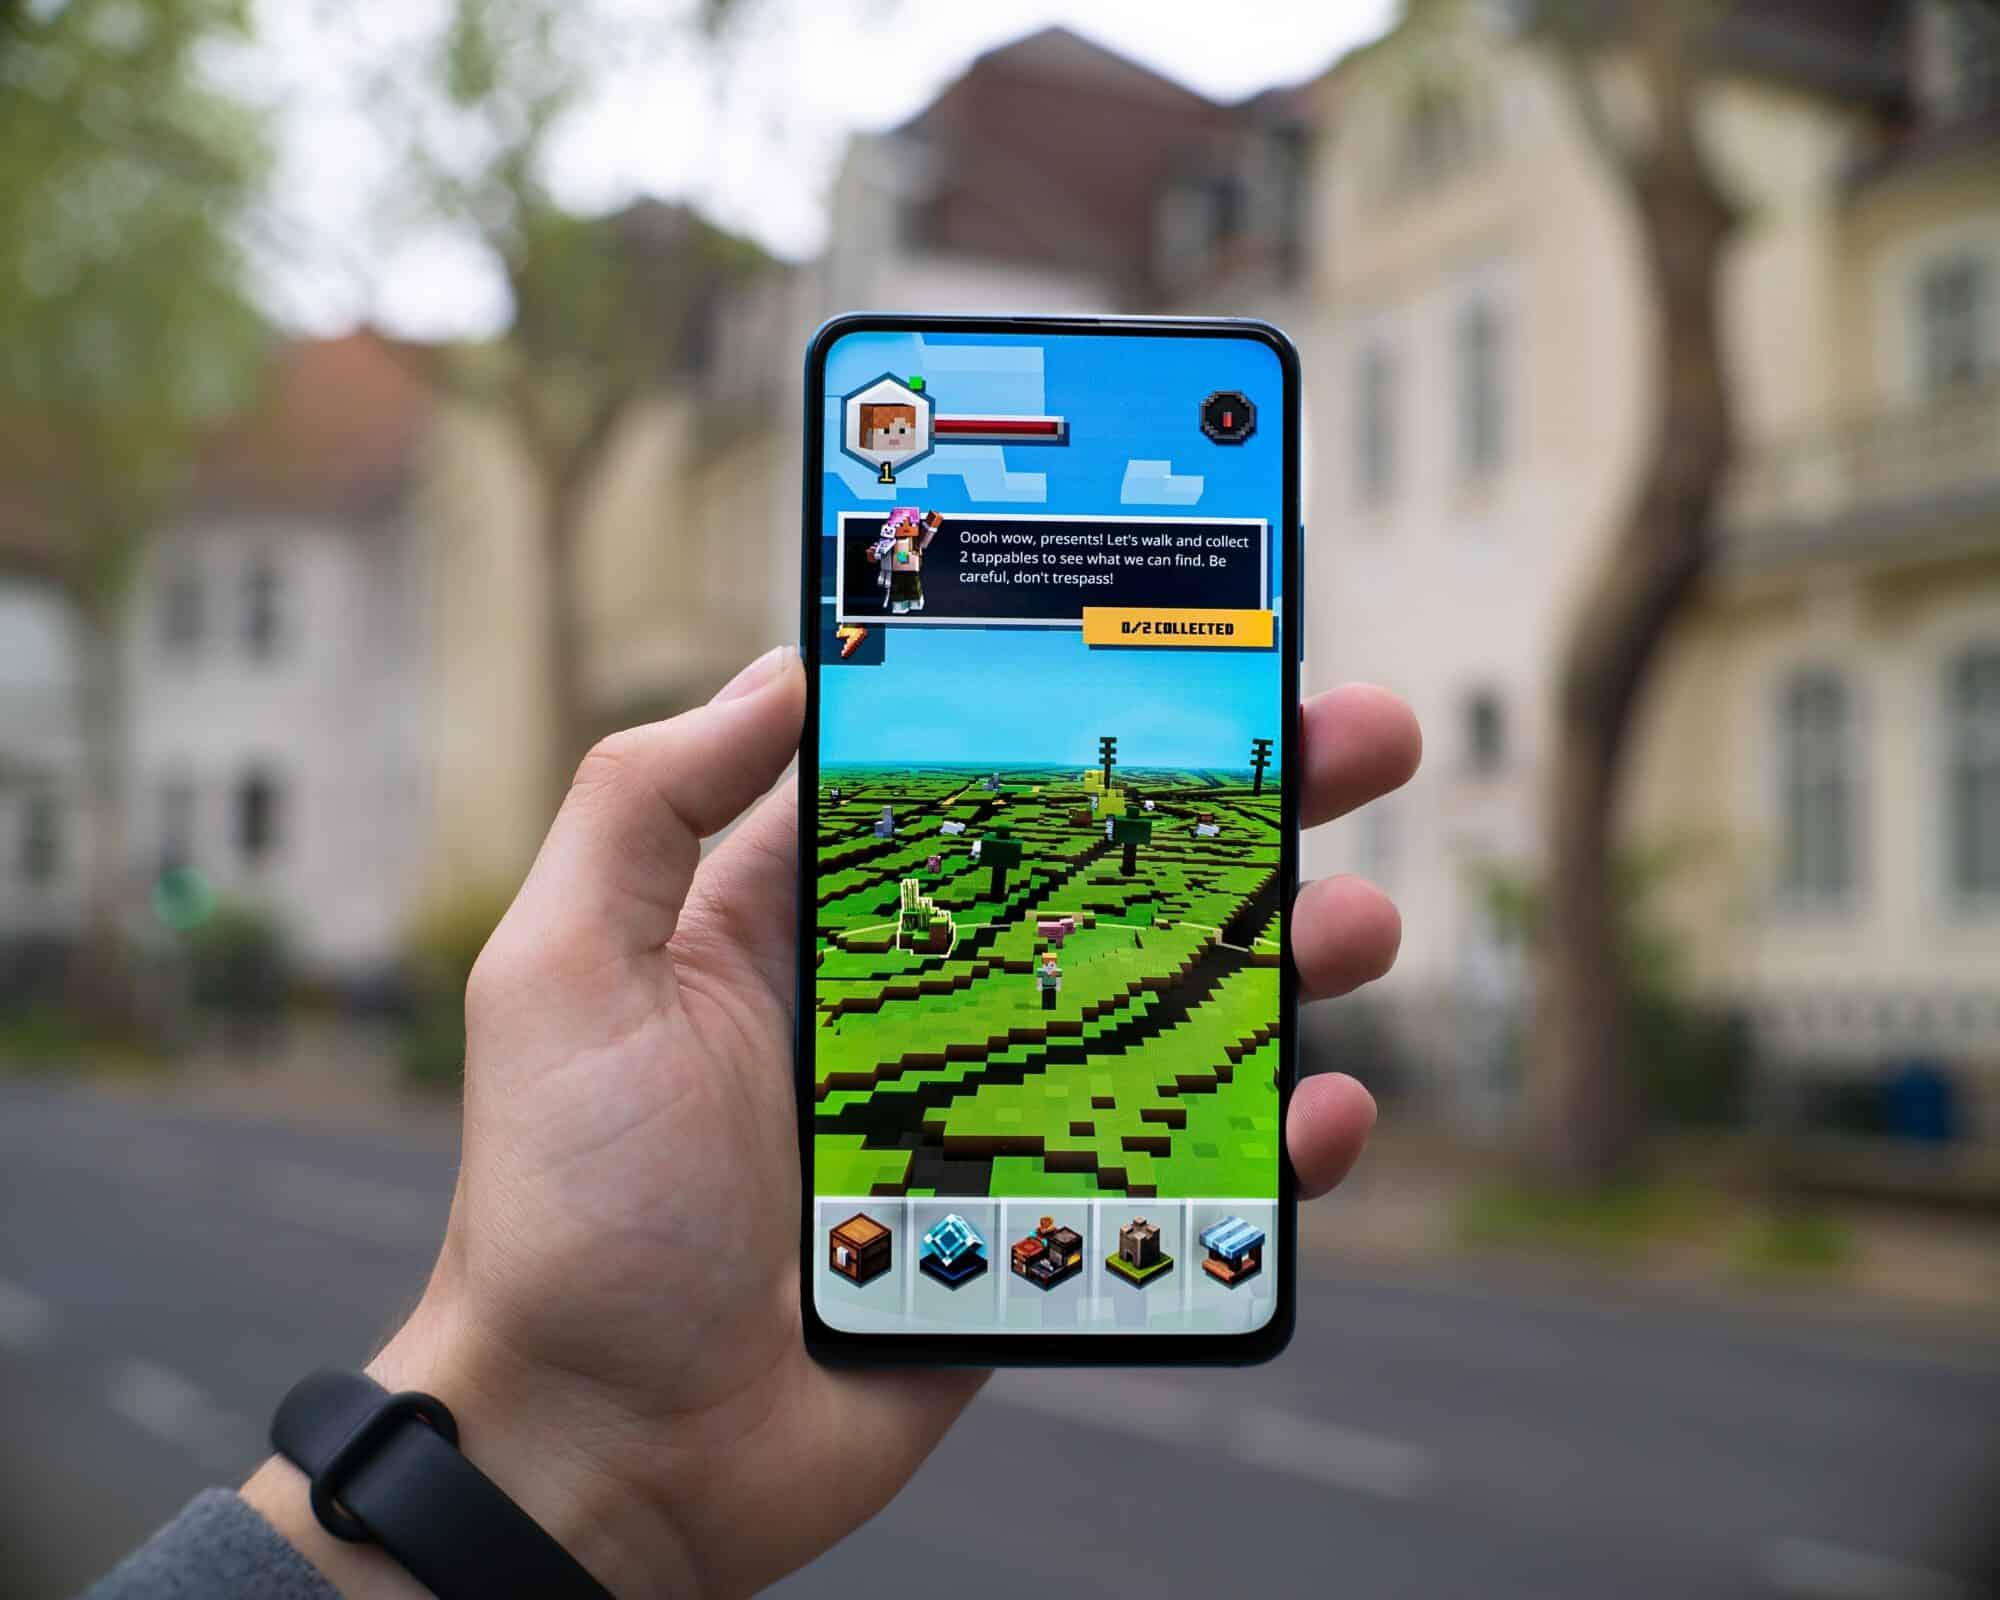 Divertissement et jeux en ligne app smartphone